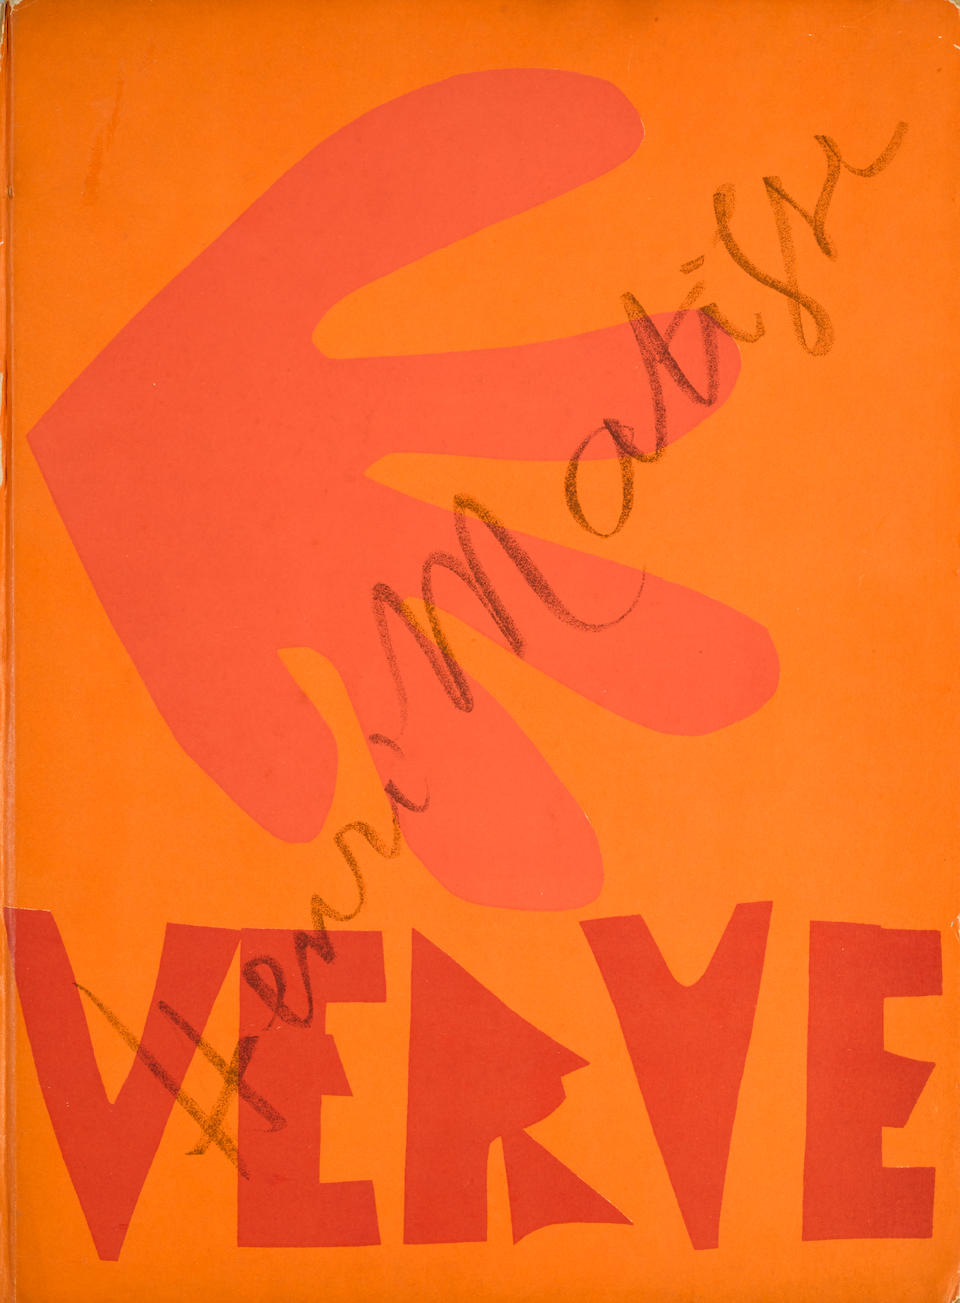 MATISSE, HENRI. 1869-1954. The Last Works of Matisse 1950-1954. New York: Harcourt, Brace & Co., [1958.]